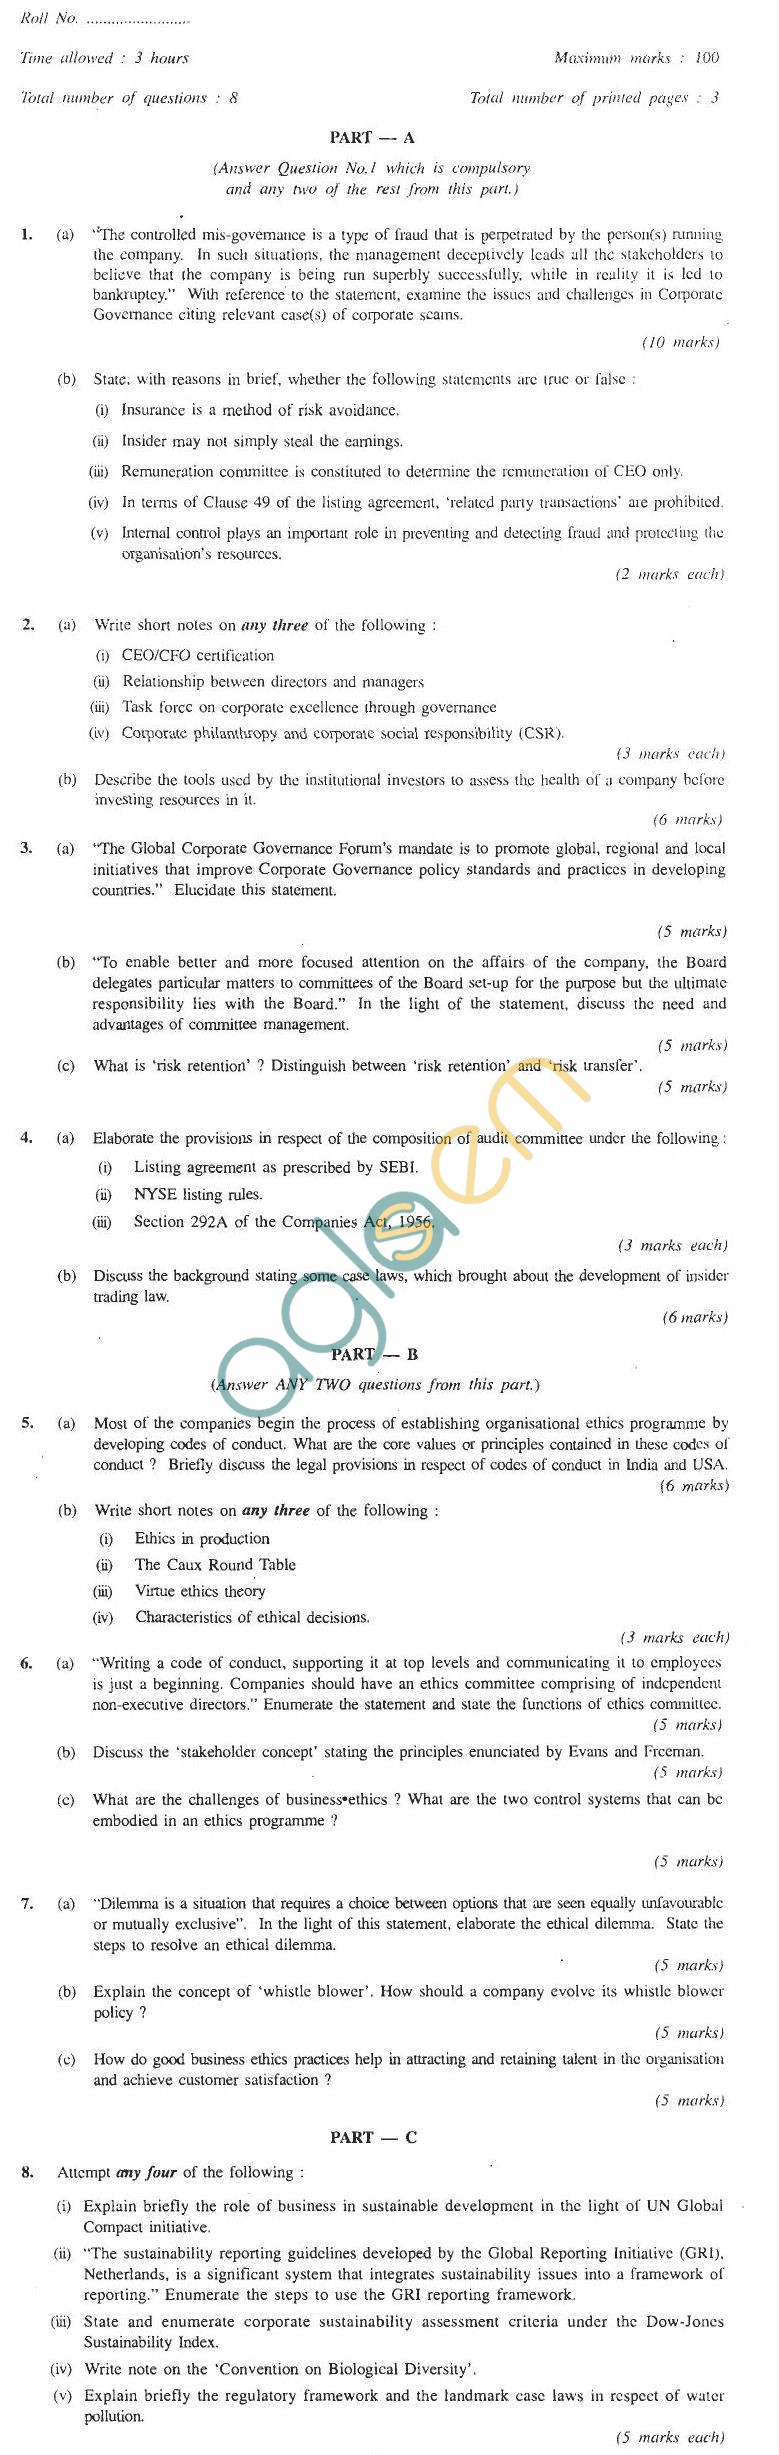 CS Professional Question PapersJun 2011 - Company Secretarial Practice Module I